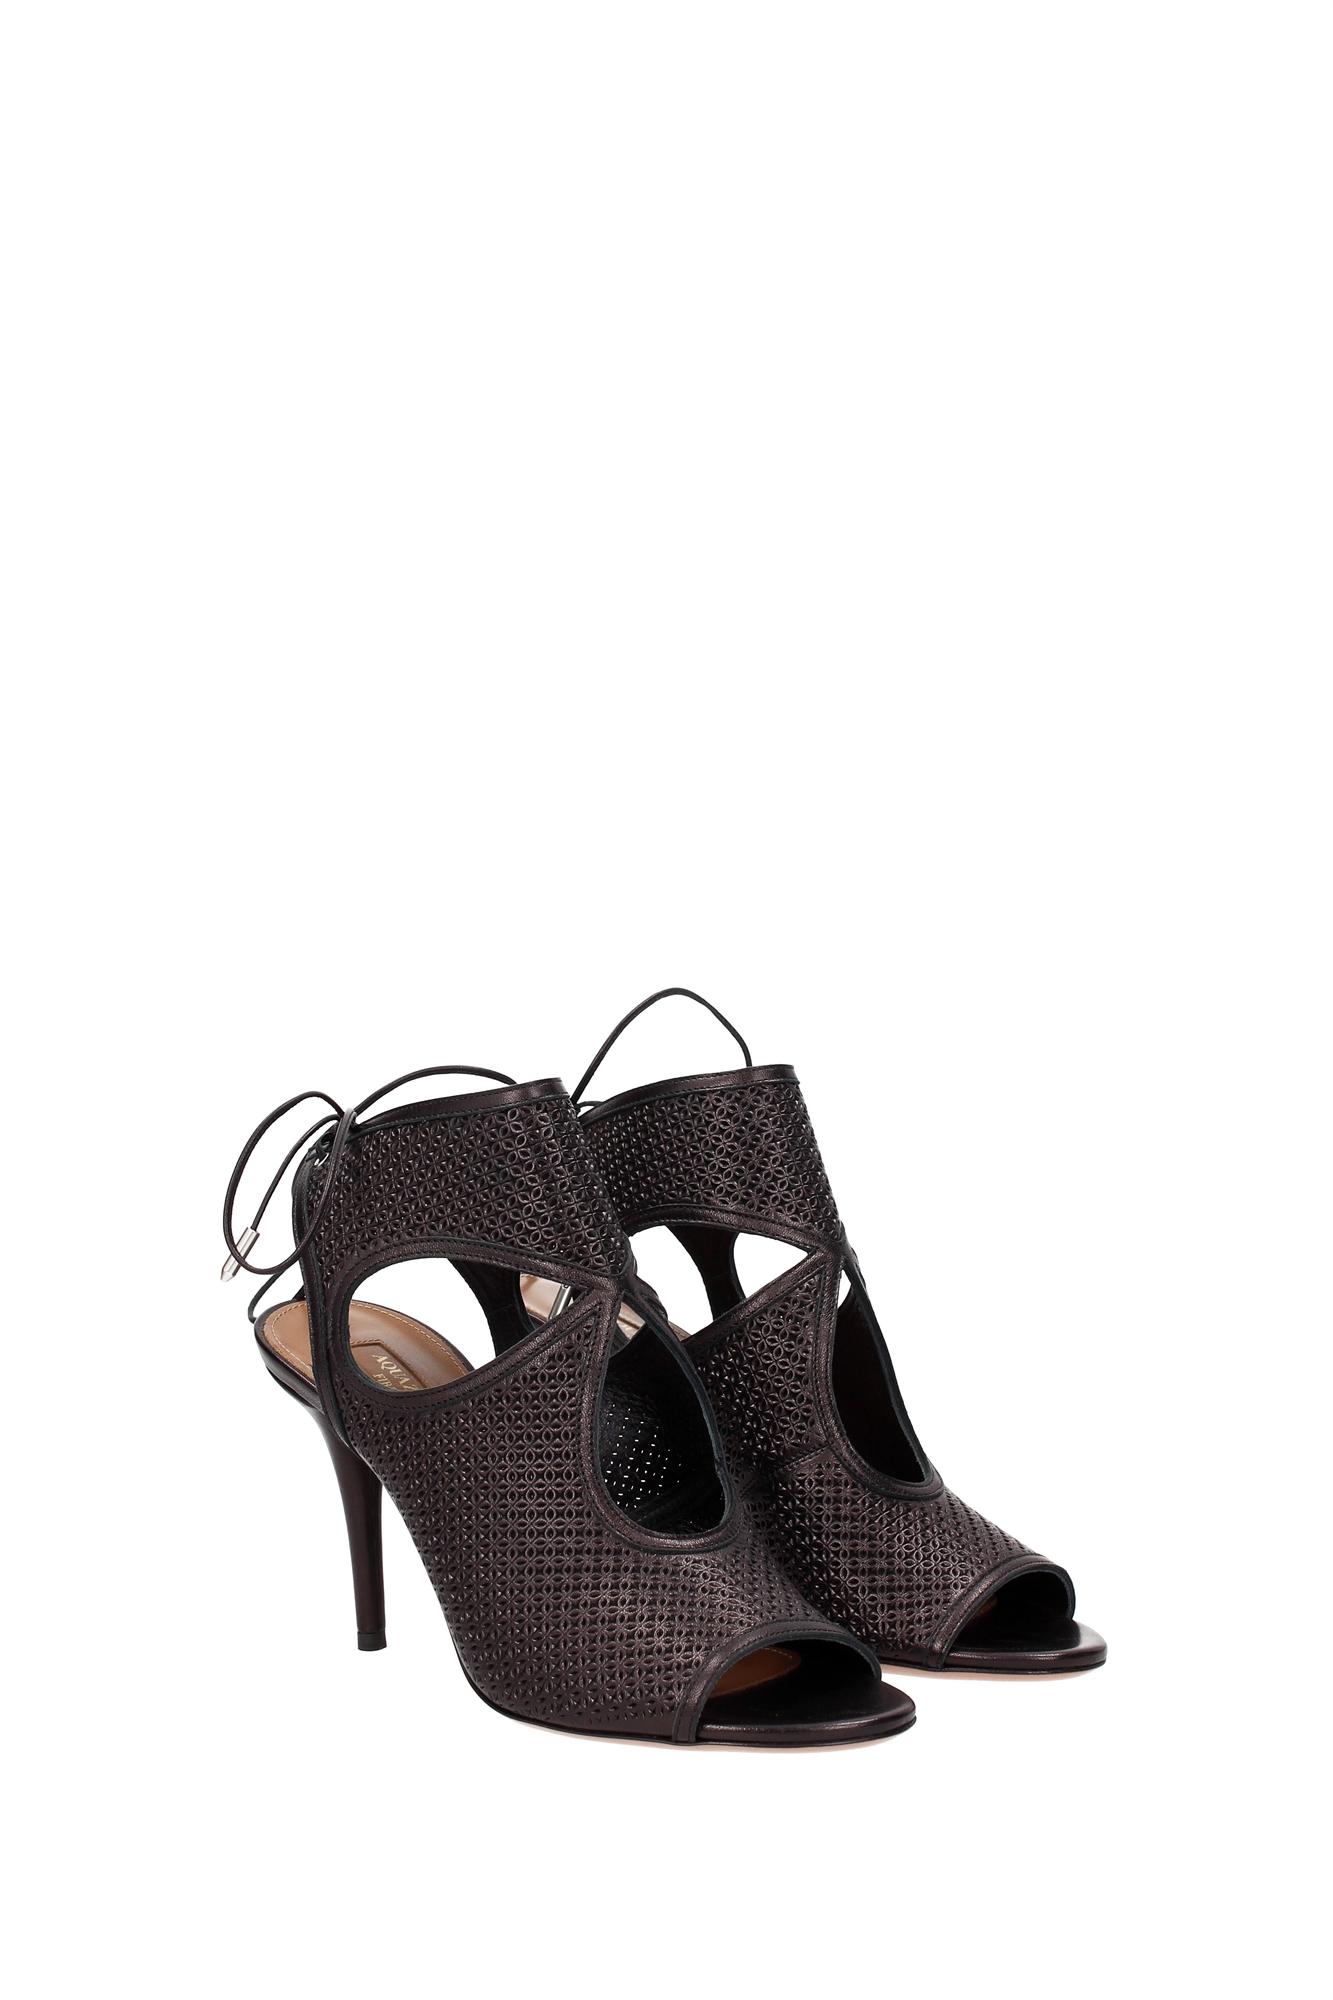 sandalen aquazzura damen leder schwarz sexmidb0npp000 ebay. Black Bedroom Furniture Sets. Home Design Ideas